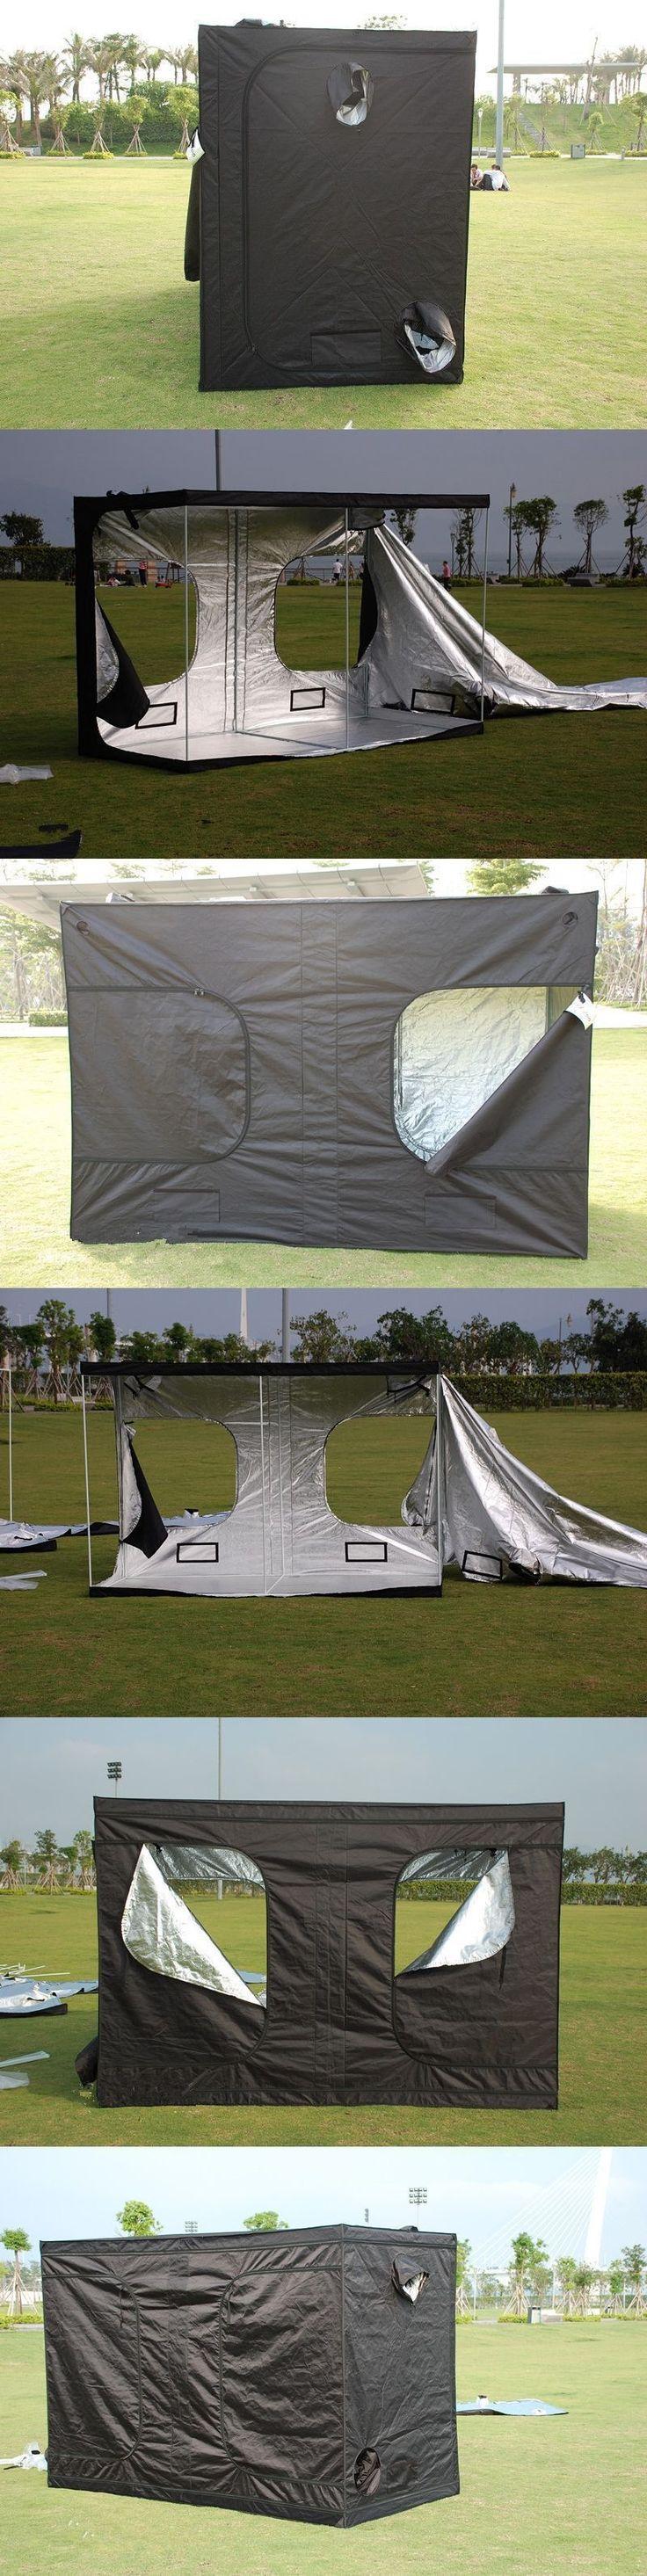 Greenhouse For Garden Indoor Hydroponic Grow Tent 600D 118x118x78Inch(300x300X200cm) Grow Ventilation Balcony Home & Více než 25 nejlepších nápad? na Pinterestu na téma Grow tent ...